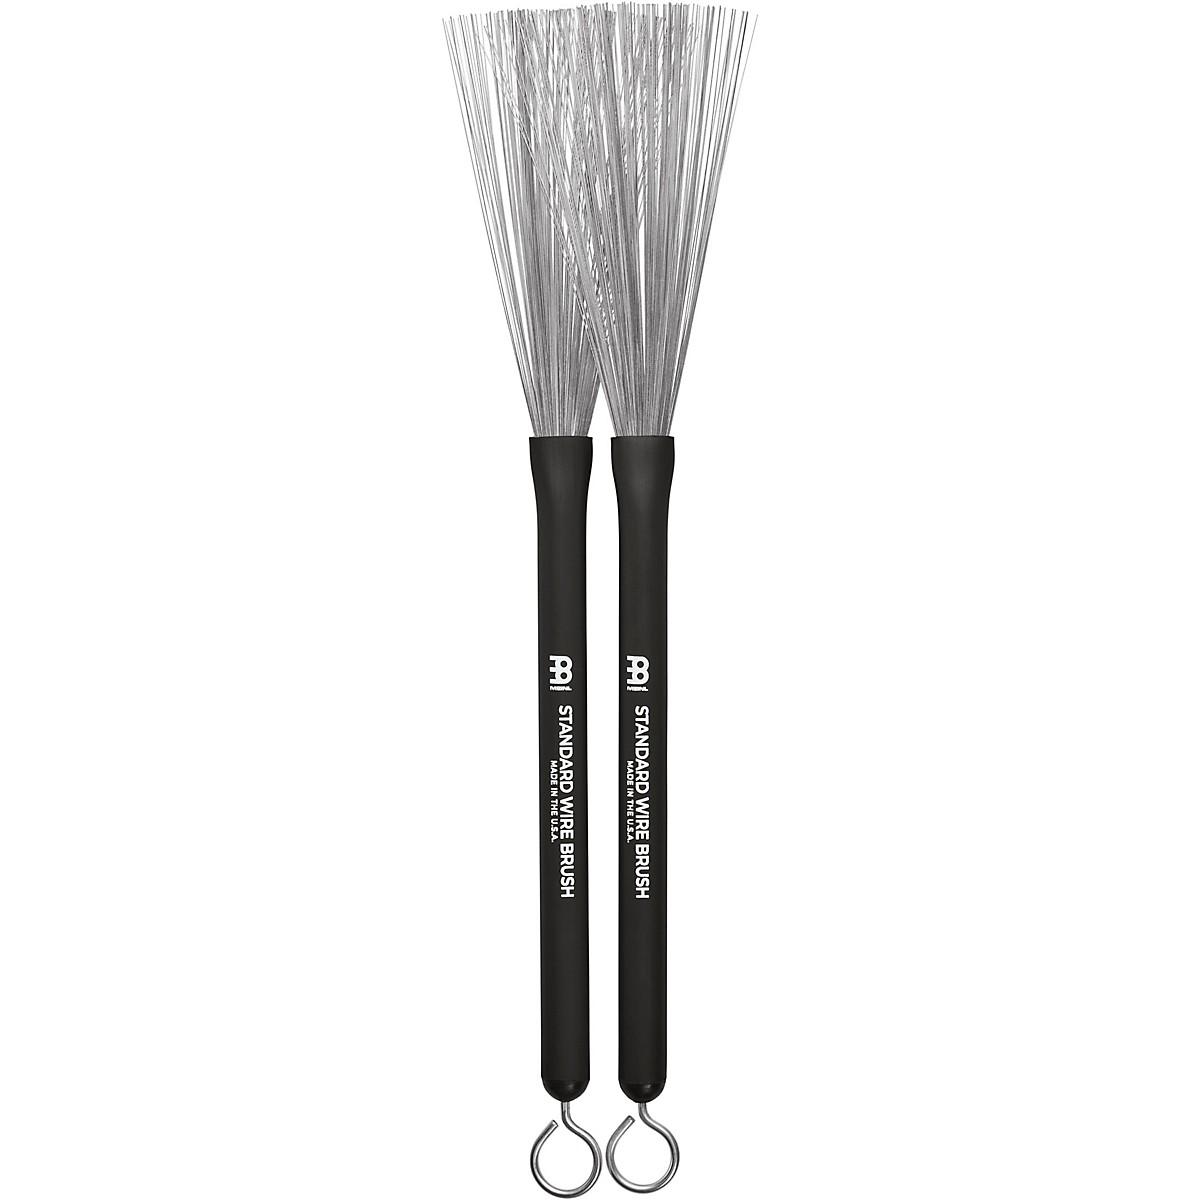 Meinl Stick & Brush Standard Wire Brushes